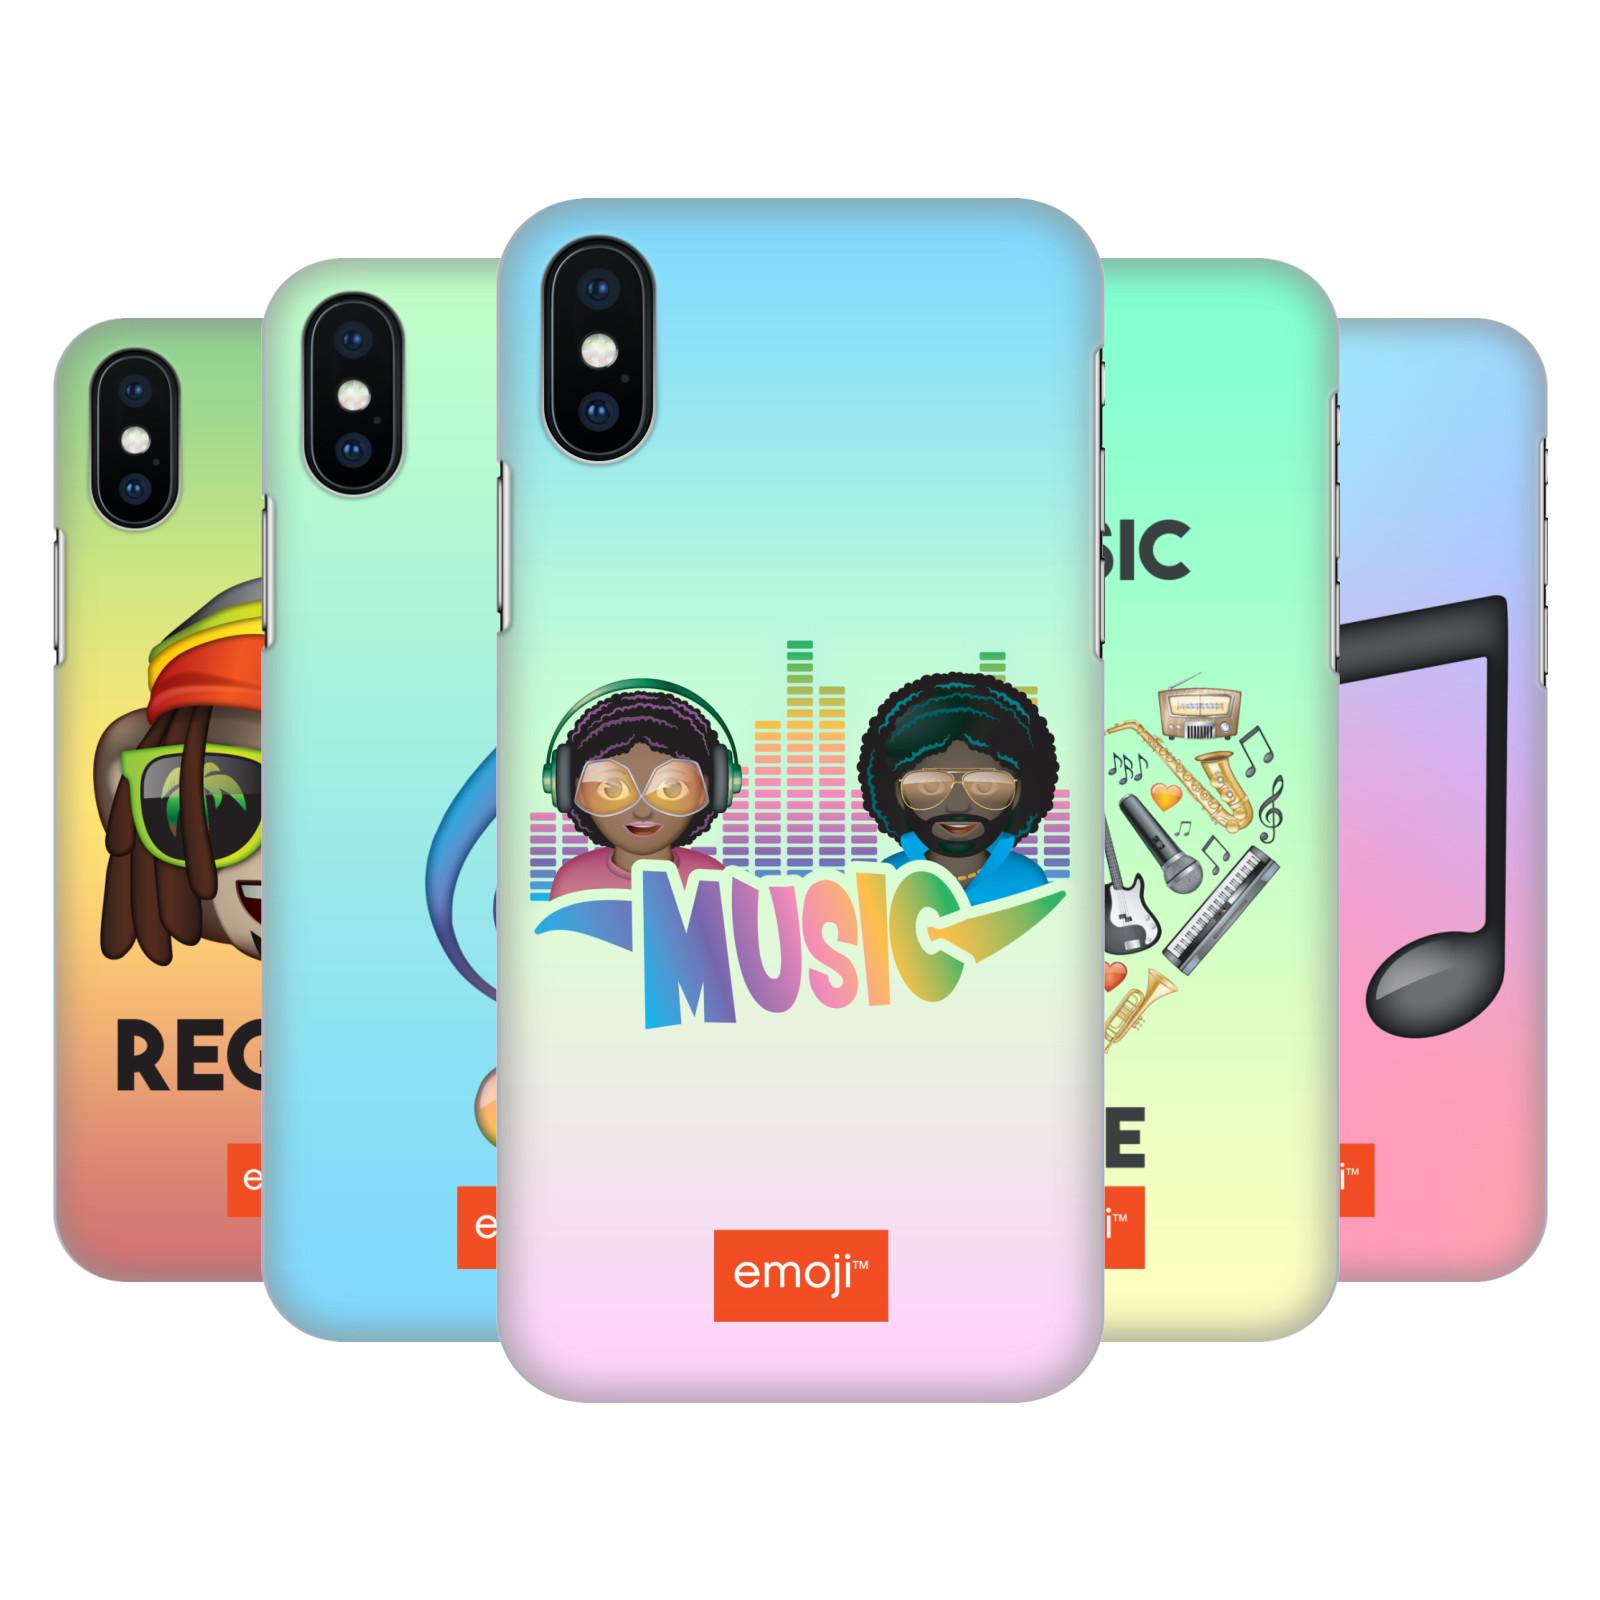 emoji® Music